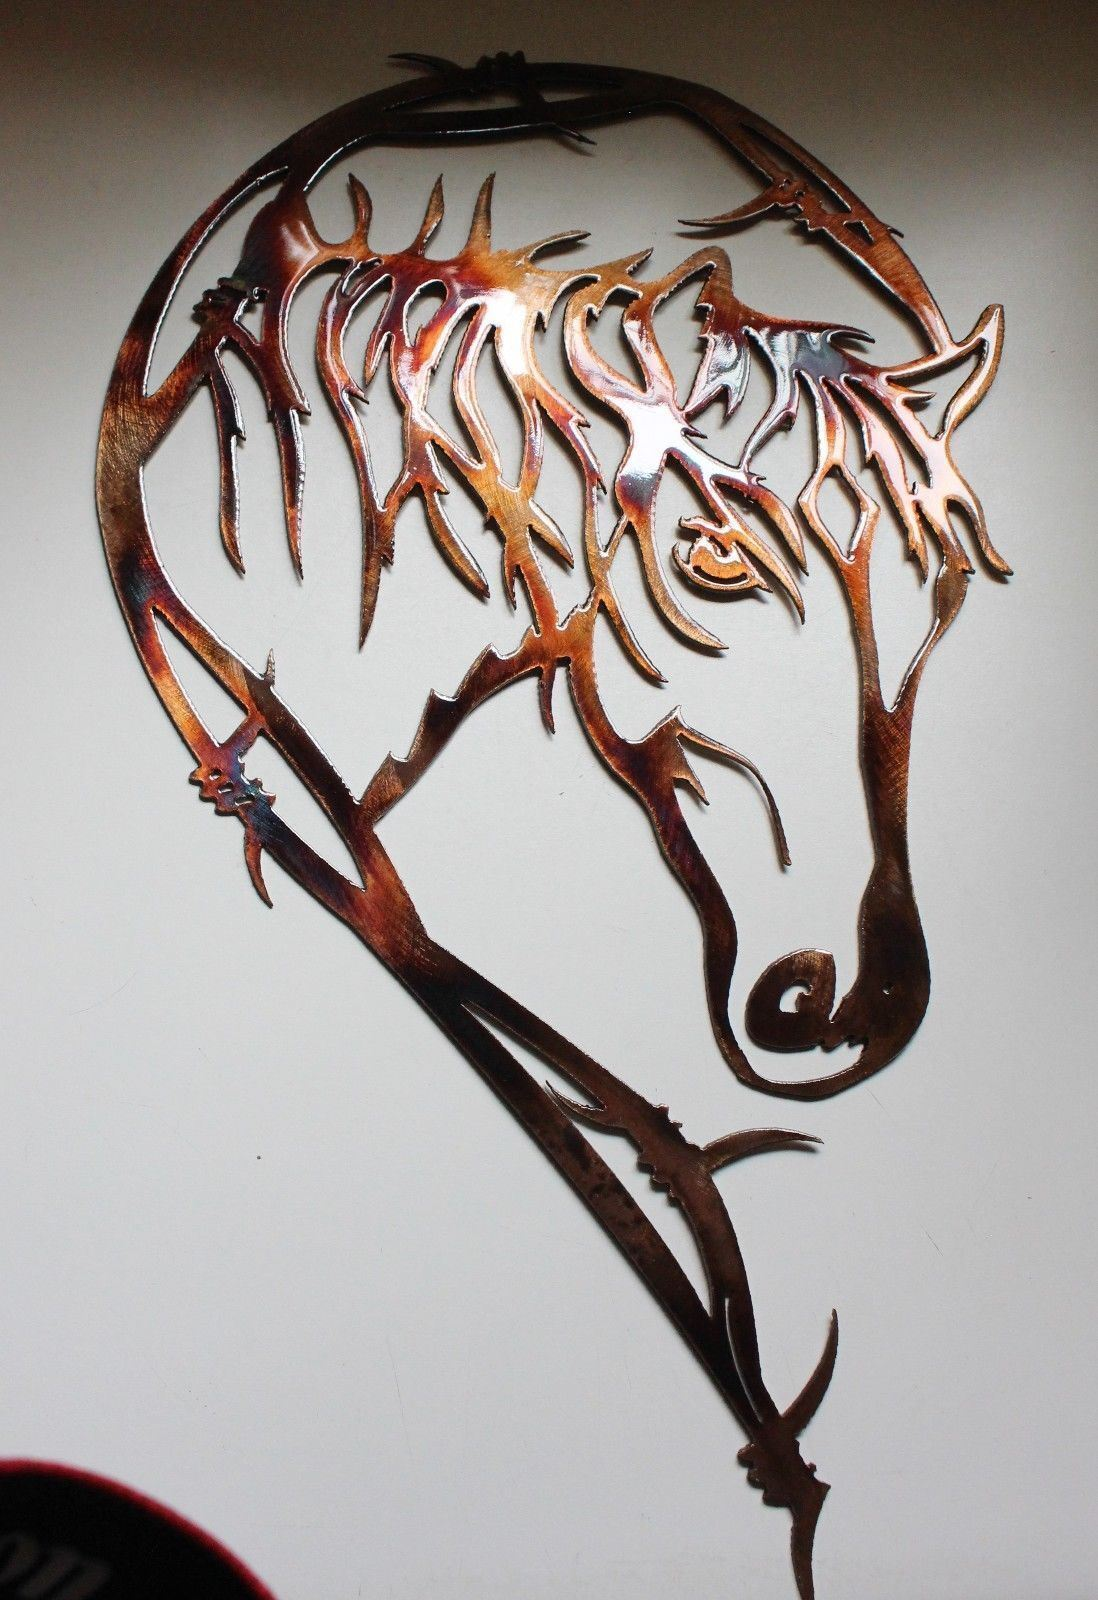 Stacheldraht Pferdekopf Metall Wandkunst Dekor 21   X 12 12 12 1.9cm   Deutschland Shops  94f8fb